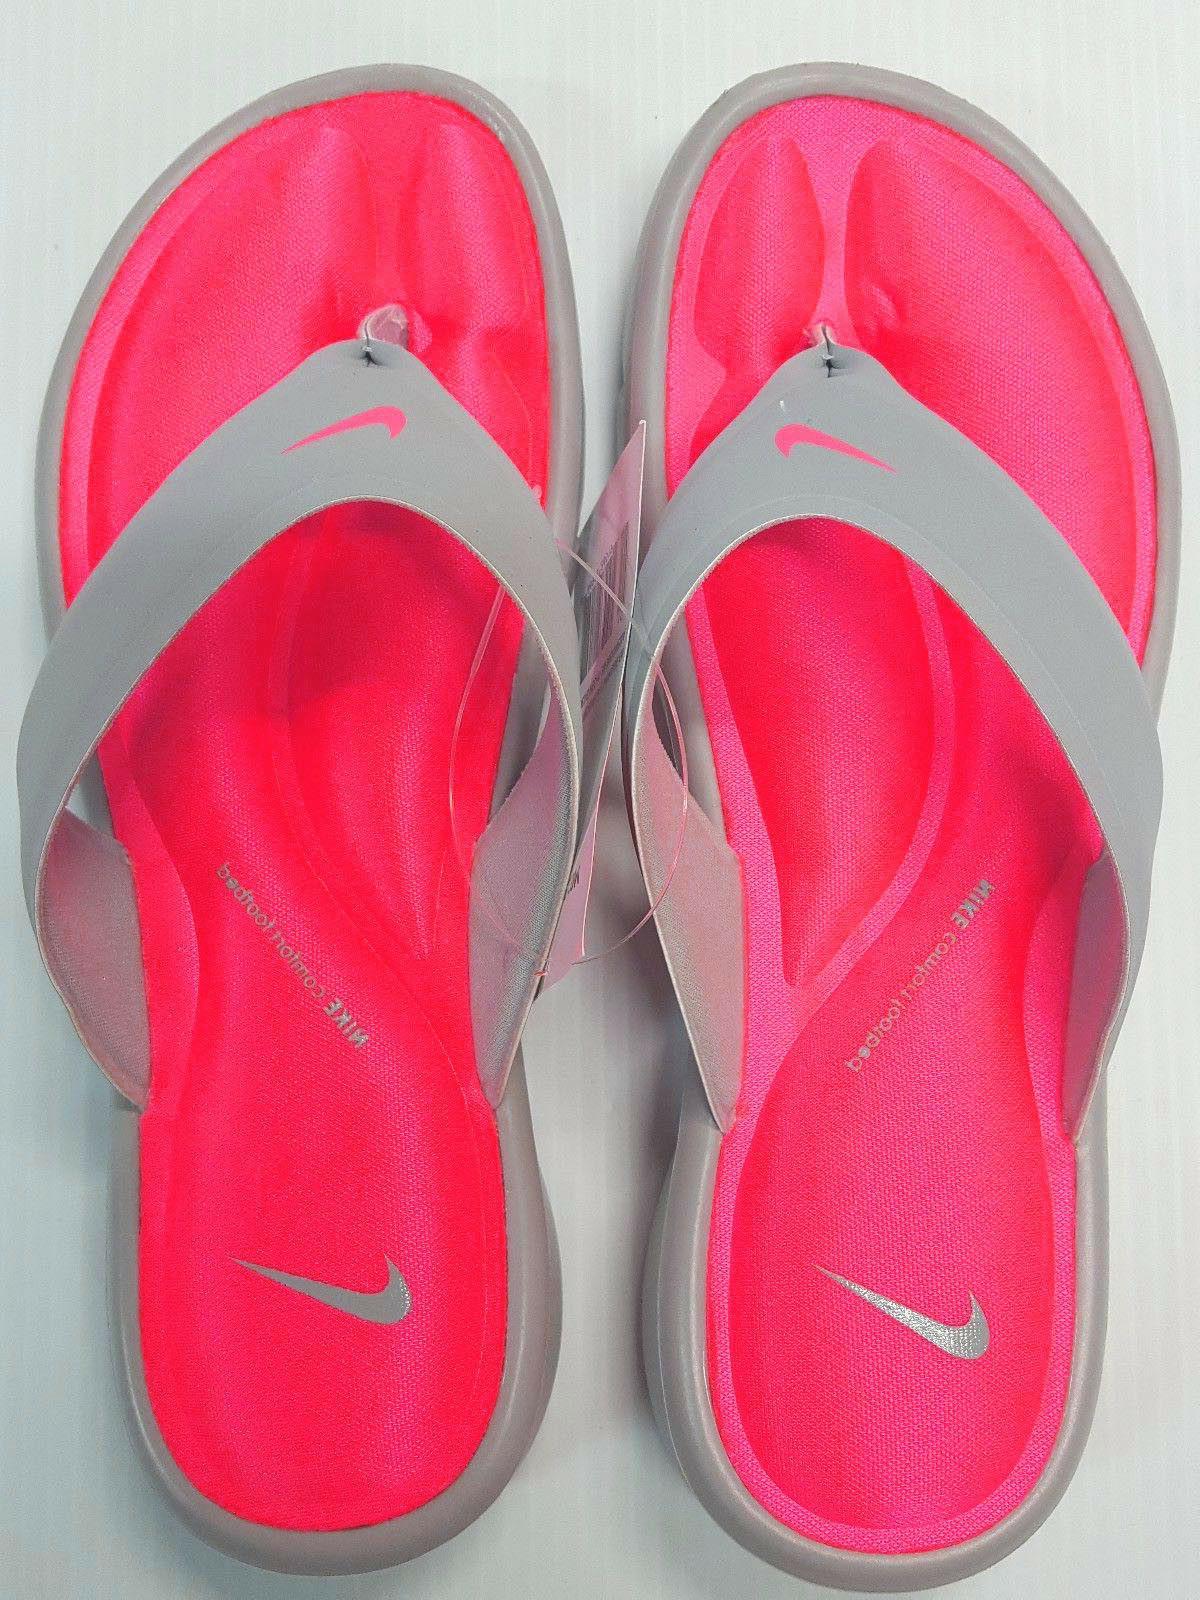 Nike Ultra Comfort Thong Flip-Flops Size 6,7,8,9,10